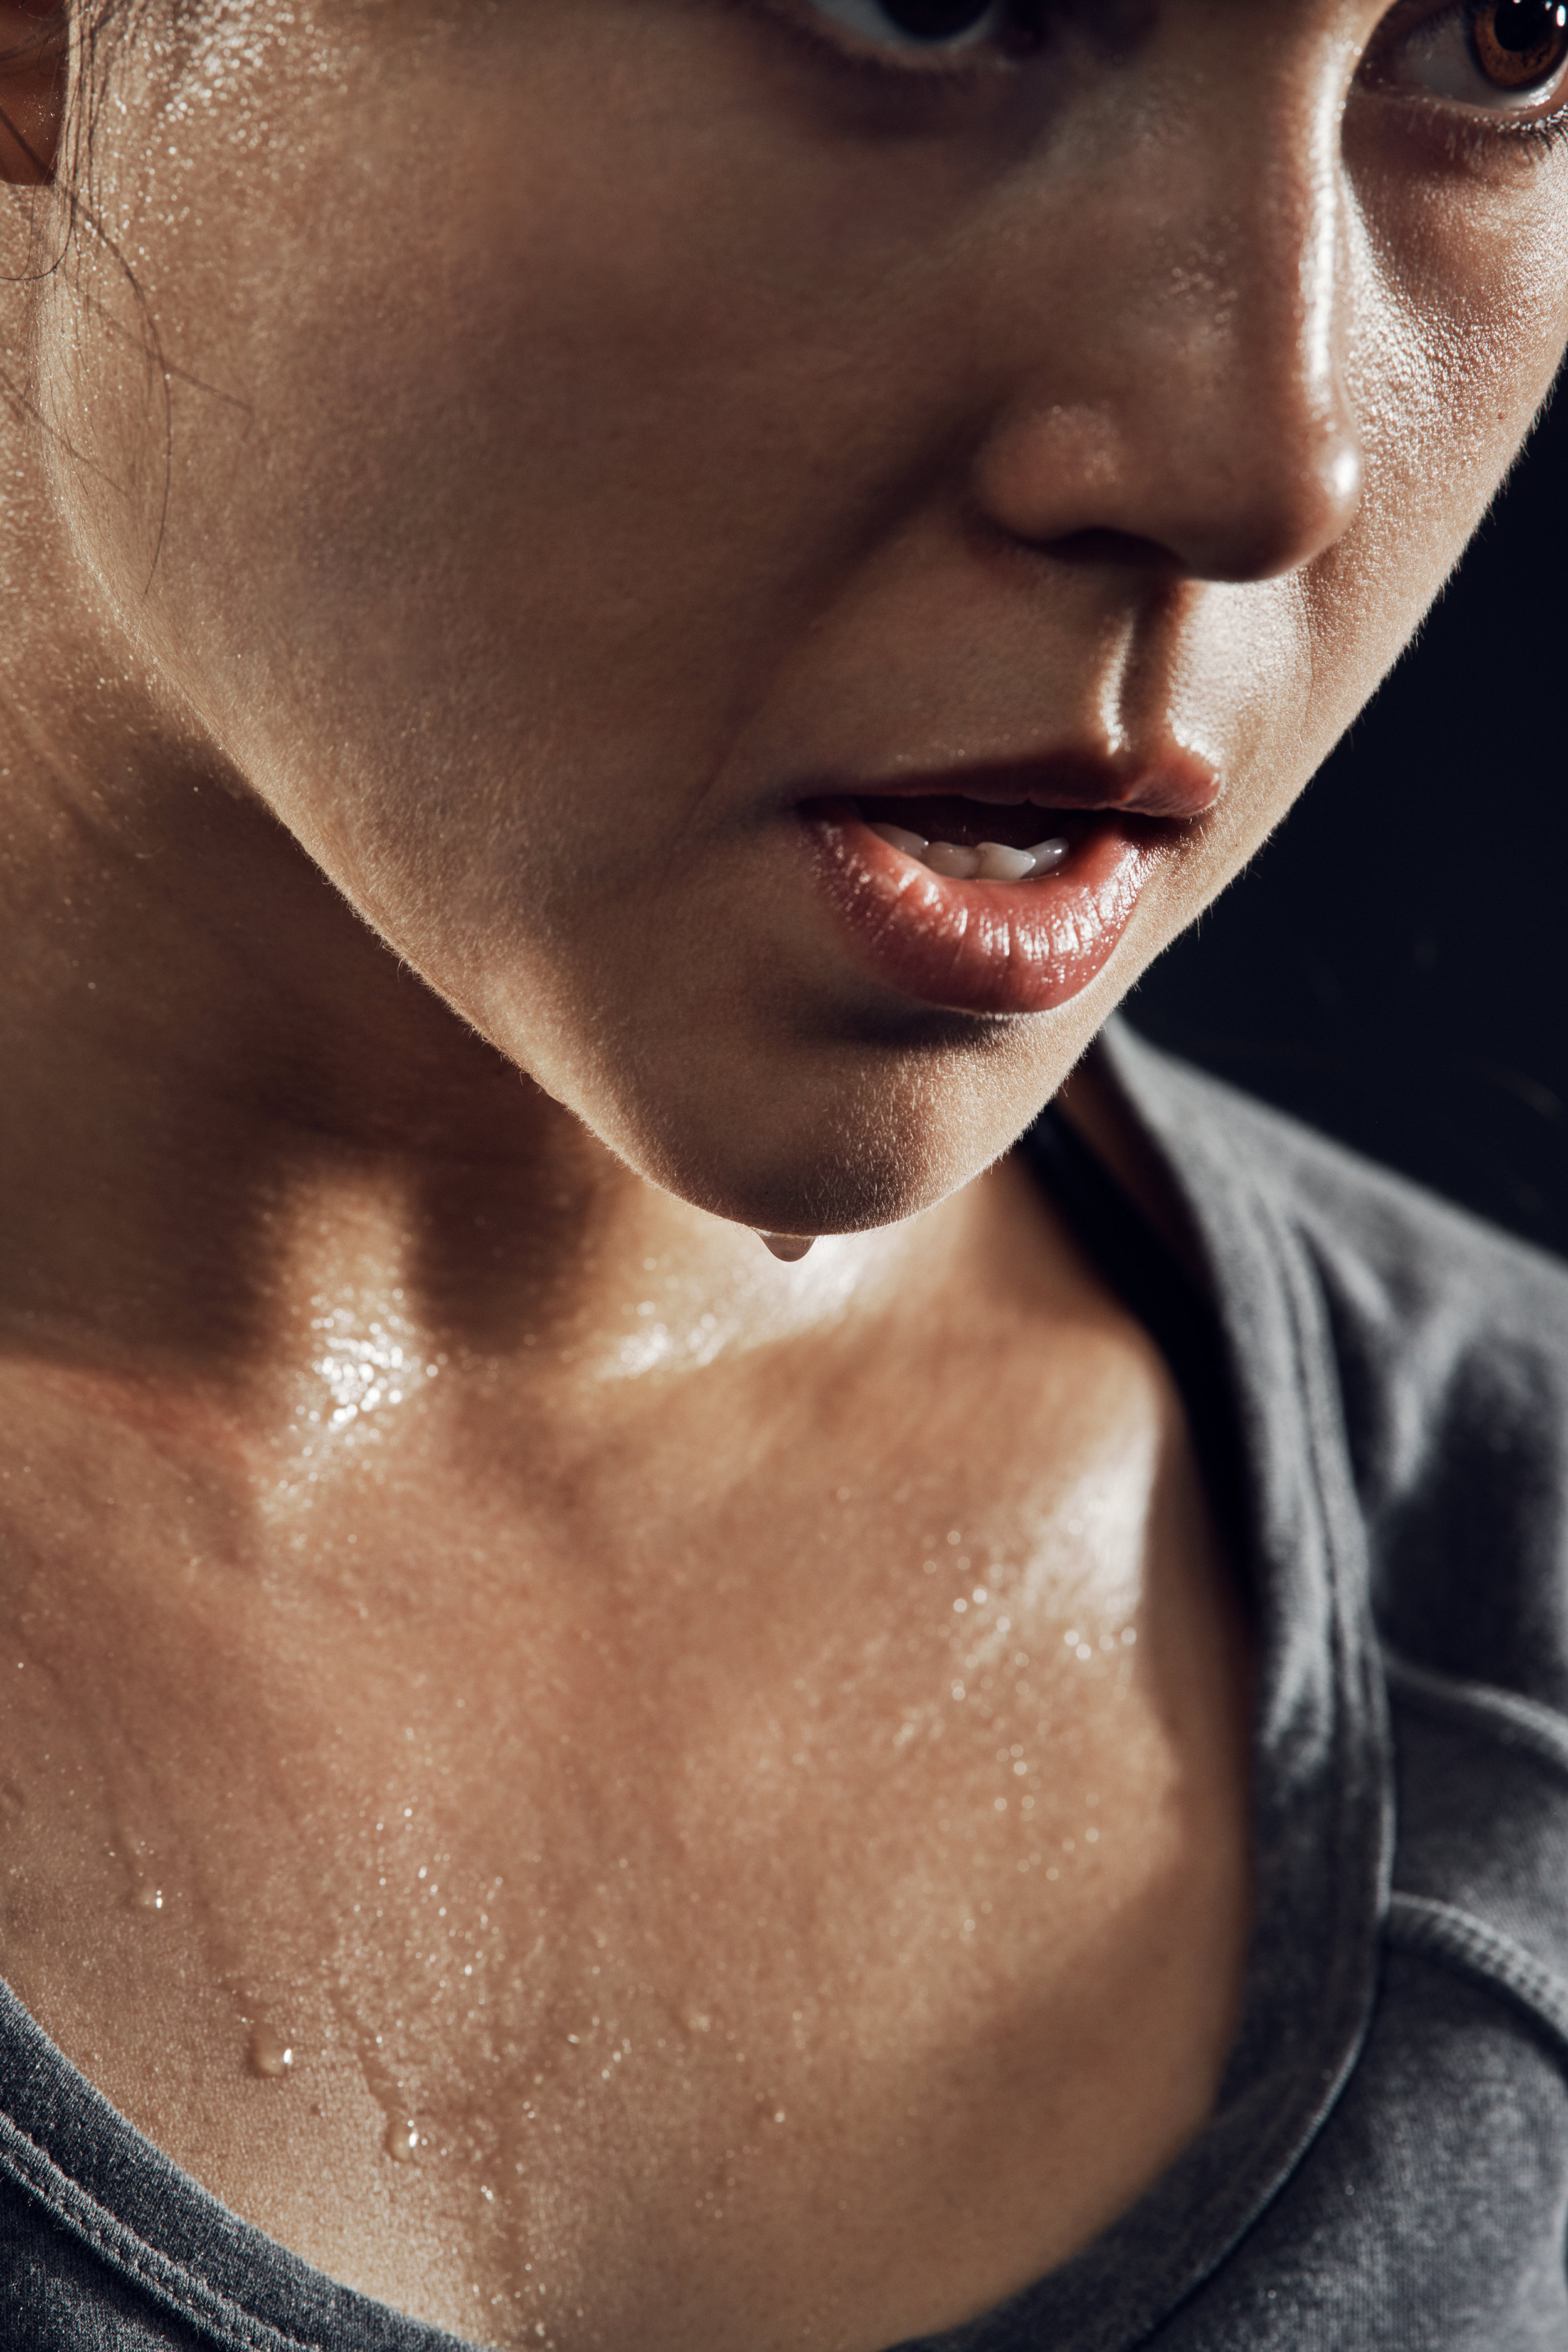 Gym_Face_CloseUps_0163.jpg